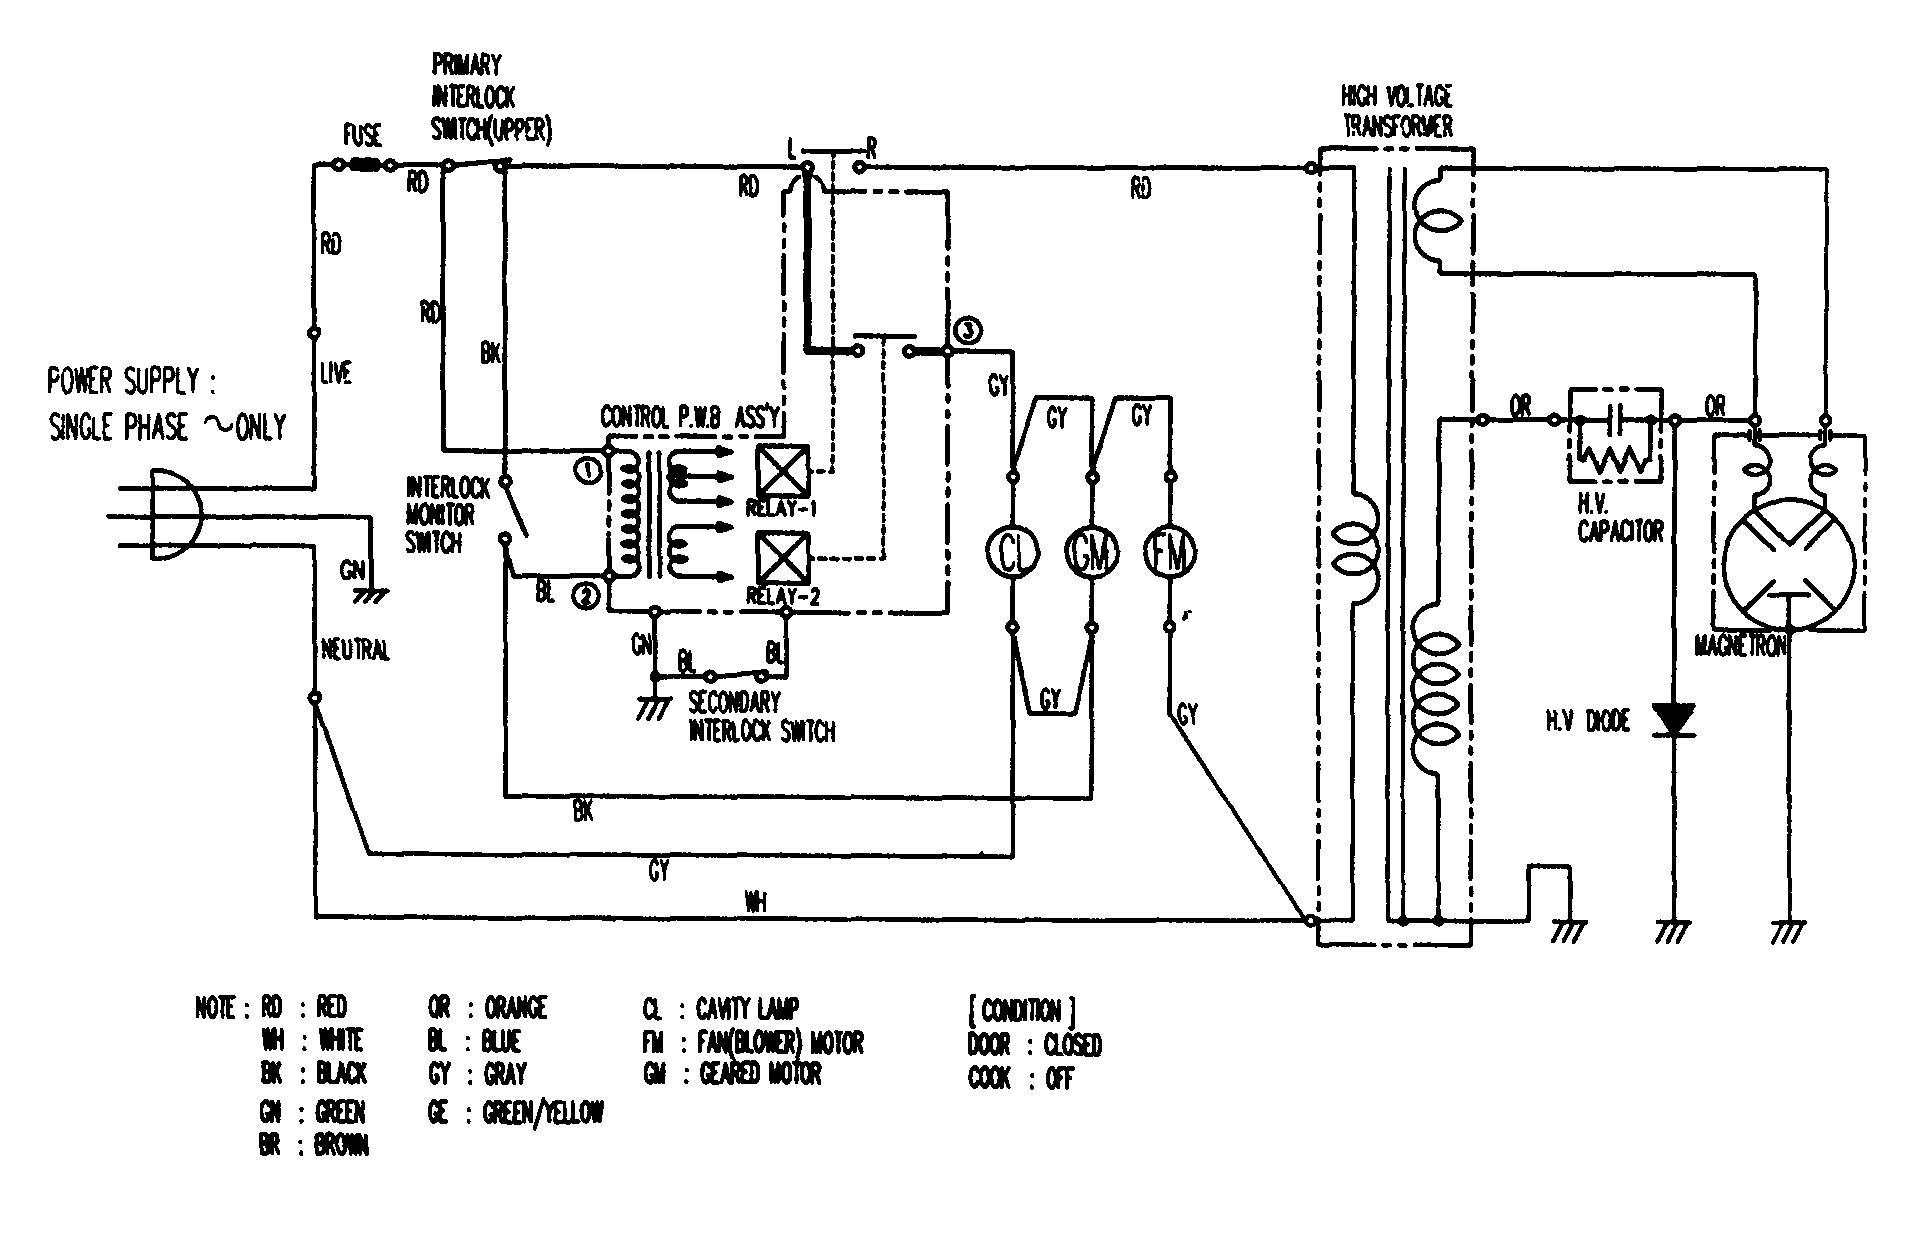 Emerson Microwave Parts